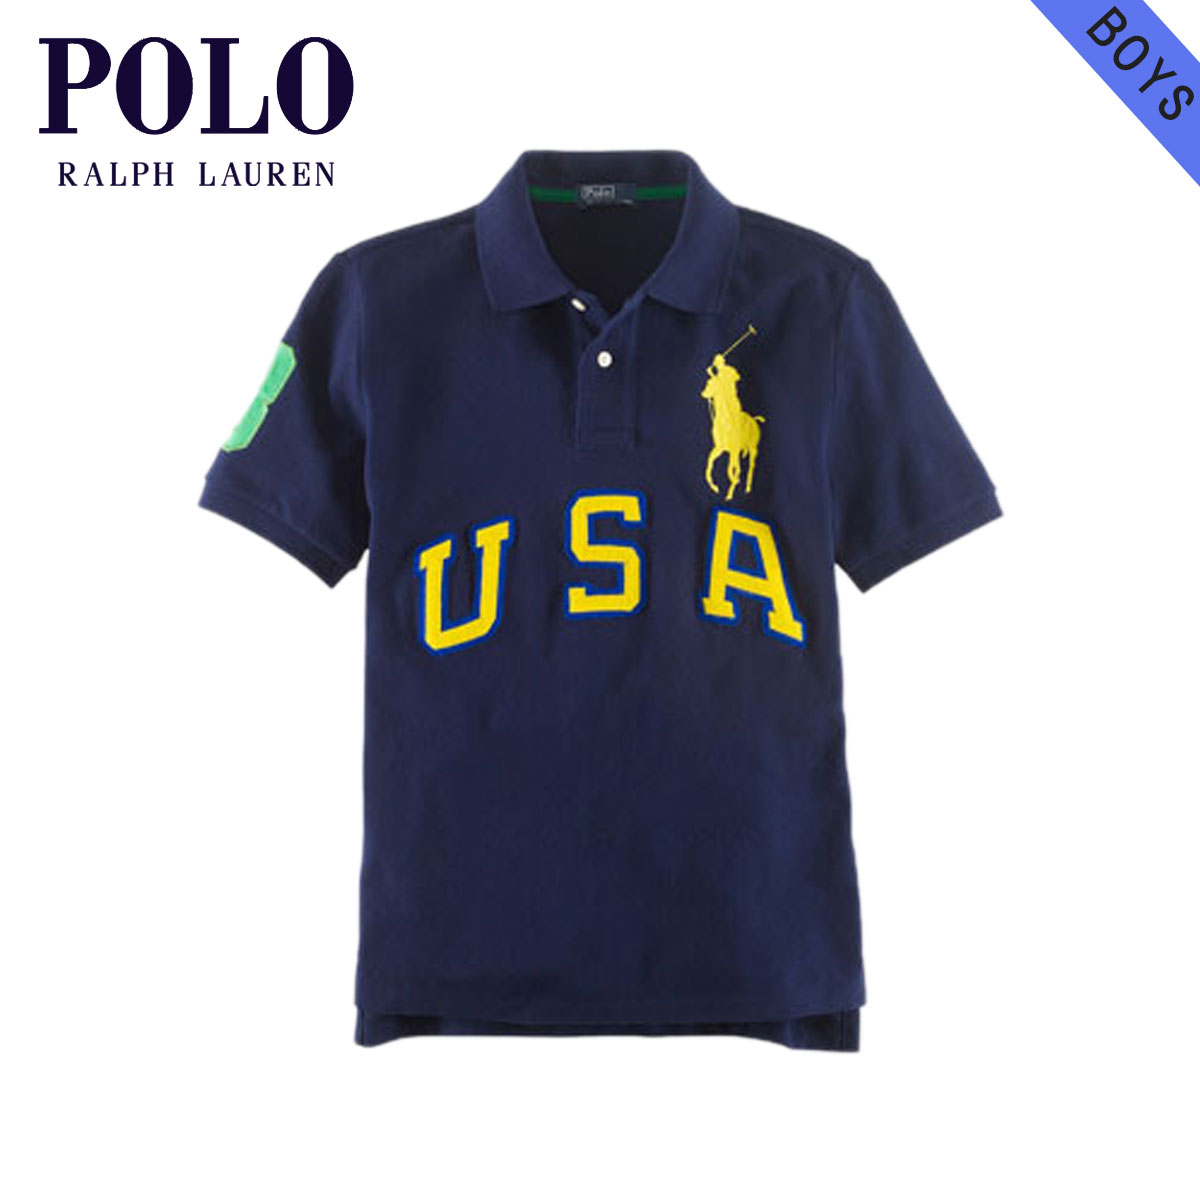 19e591df9 30%OFF sale polo Ralph Lauren kids POLO RALPH LAUREN CHILDREN regular  article children s clothes ...